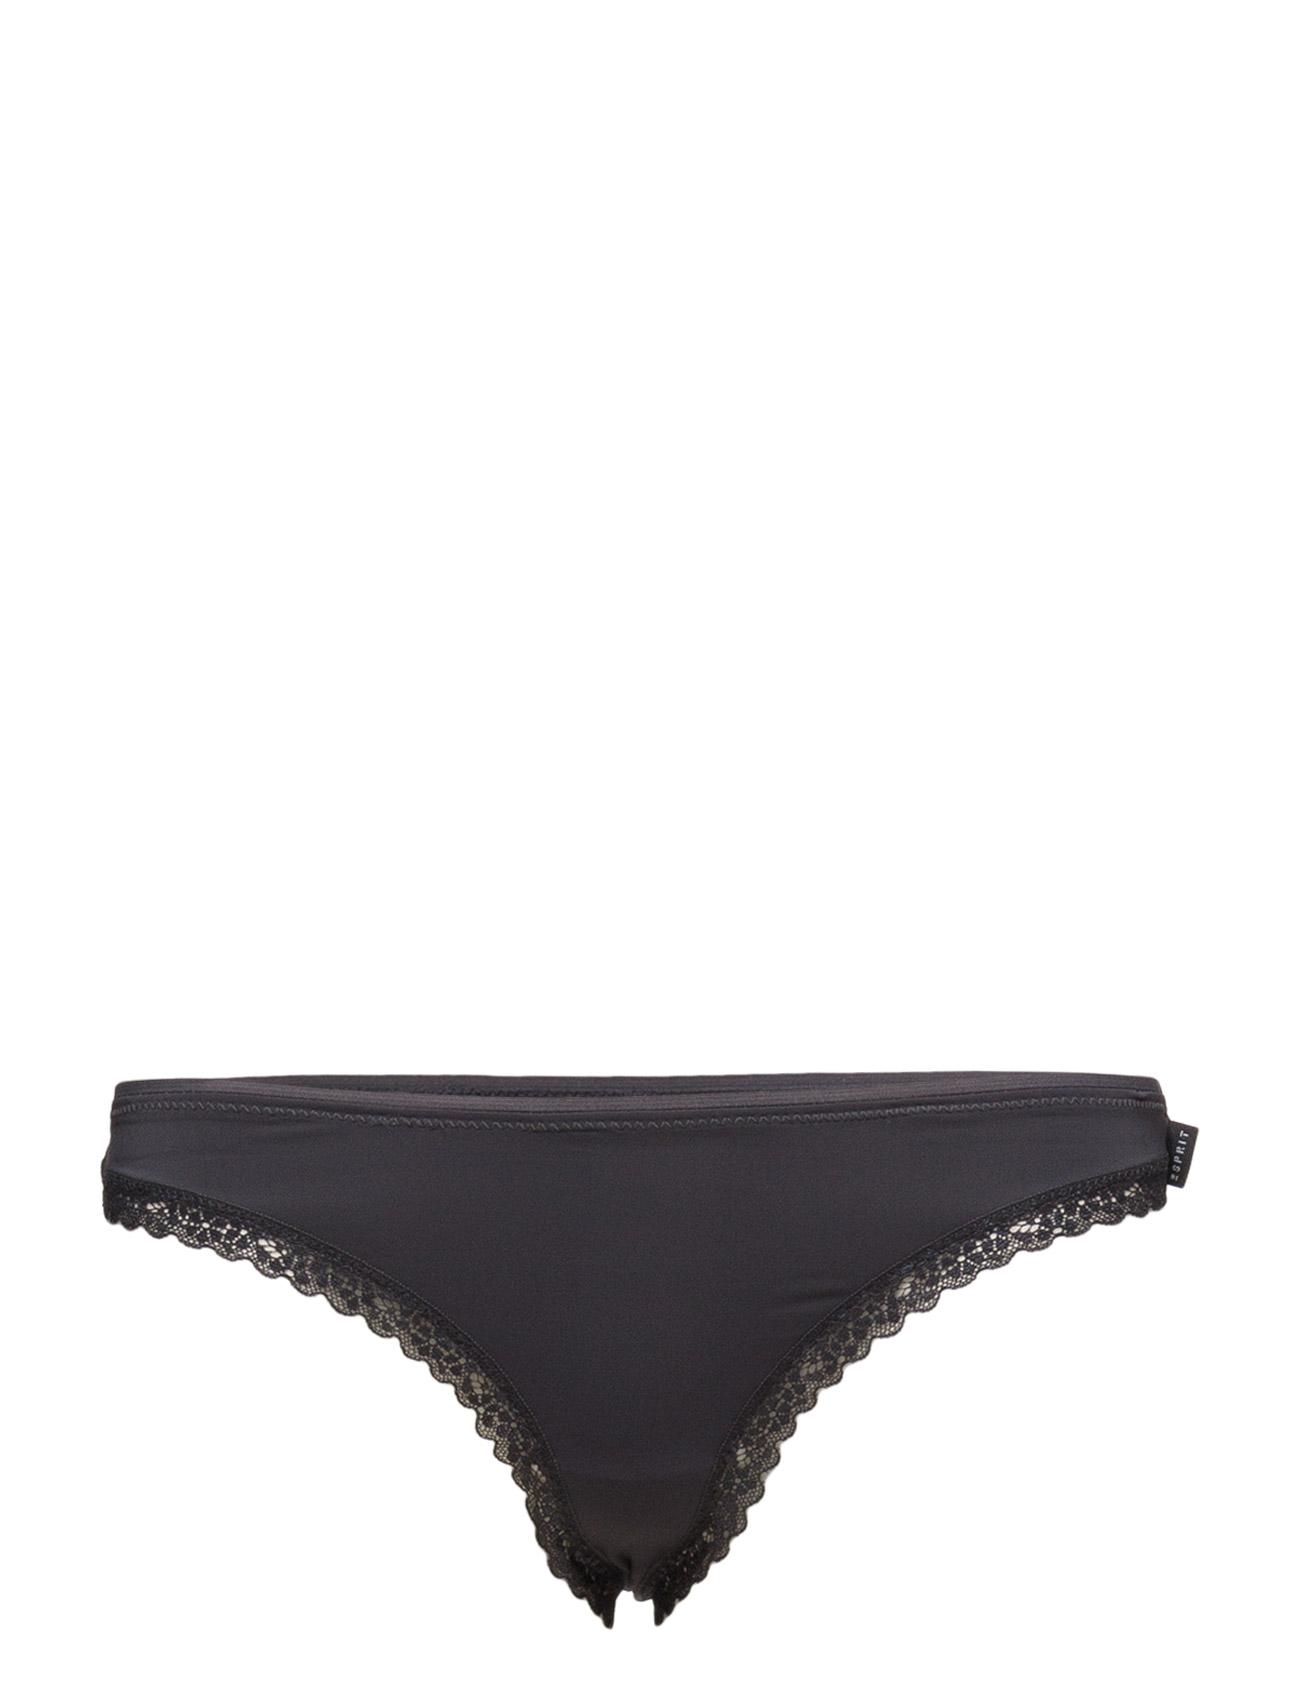 be42f7aff162 Bottoms (Dark Grey) (£10) - Esprit Bodywear Women - Briefs   Boozt.com